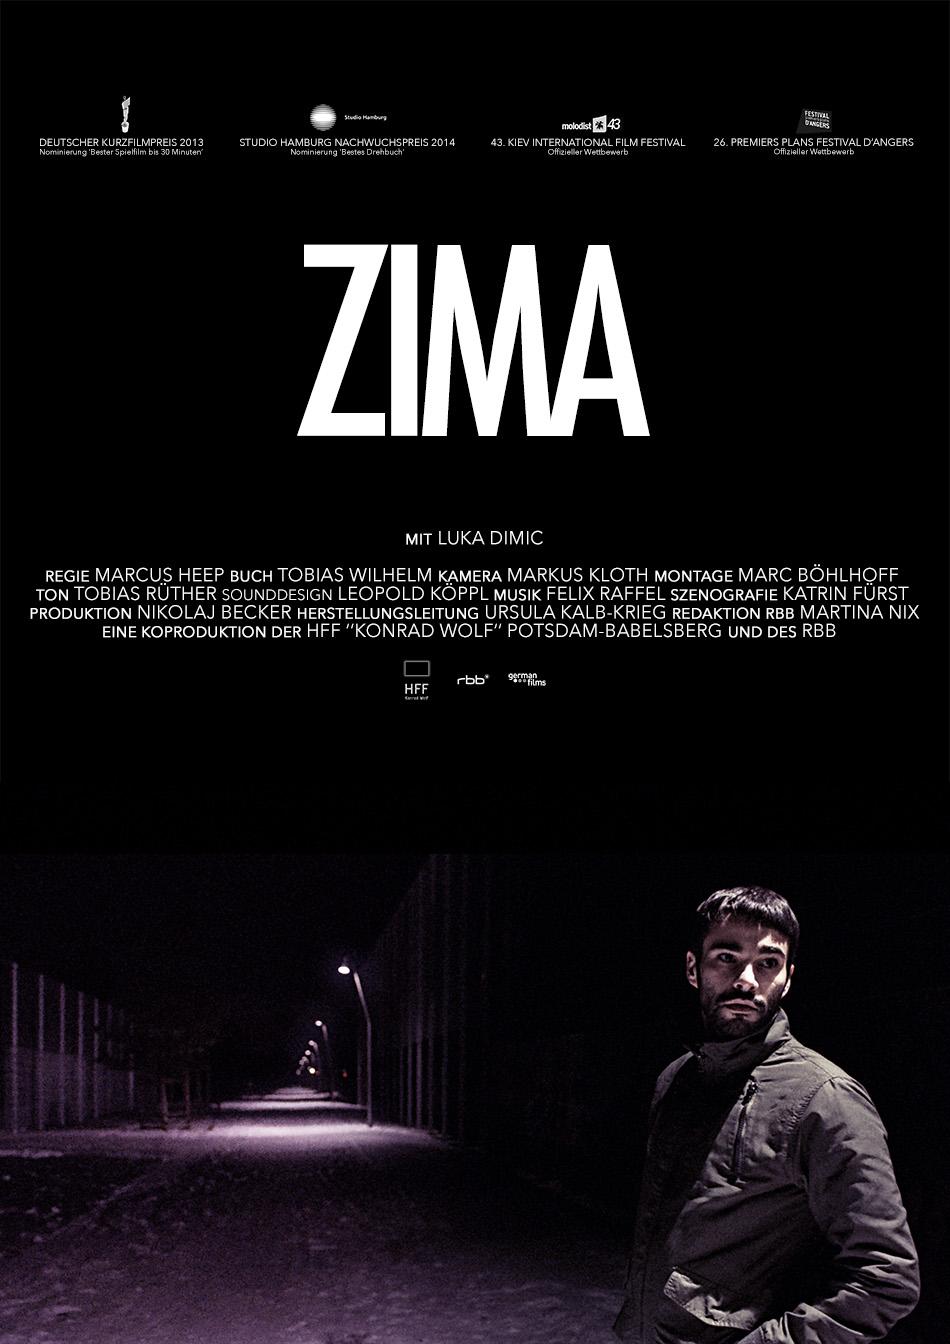 ZIMA_Poster_Entwurf_08_HFF_web